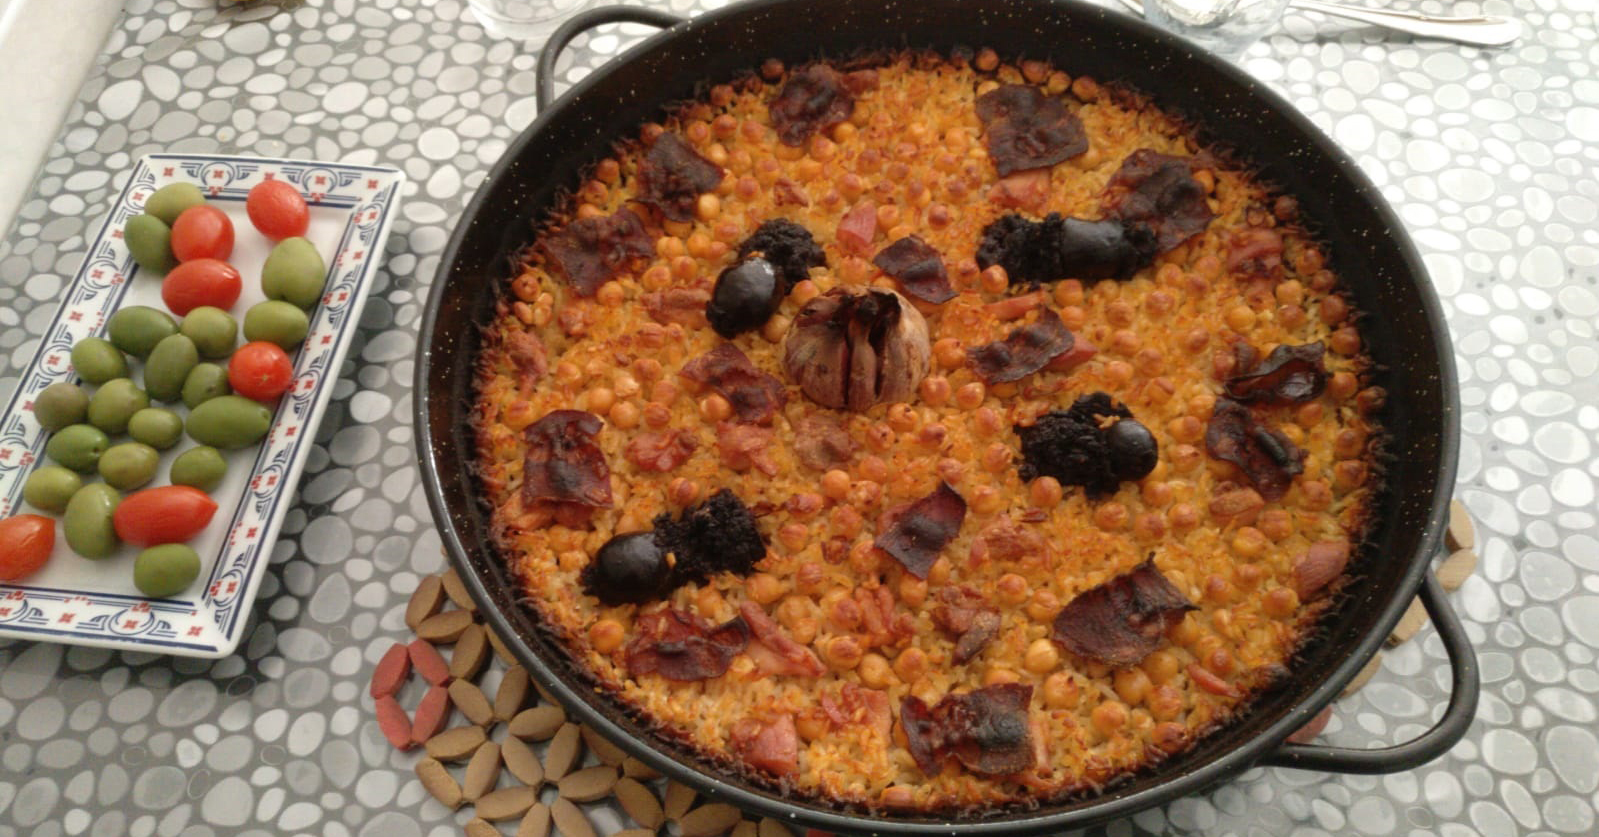 gastronomia valenciana